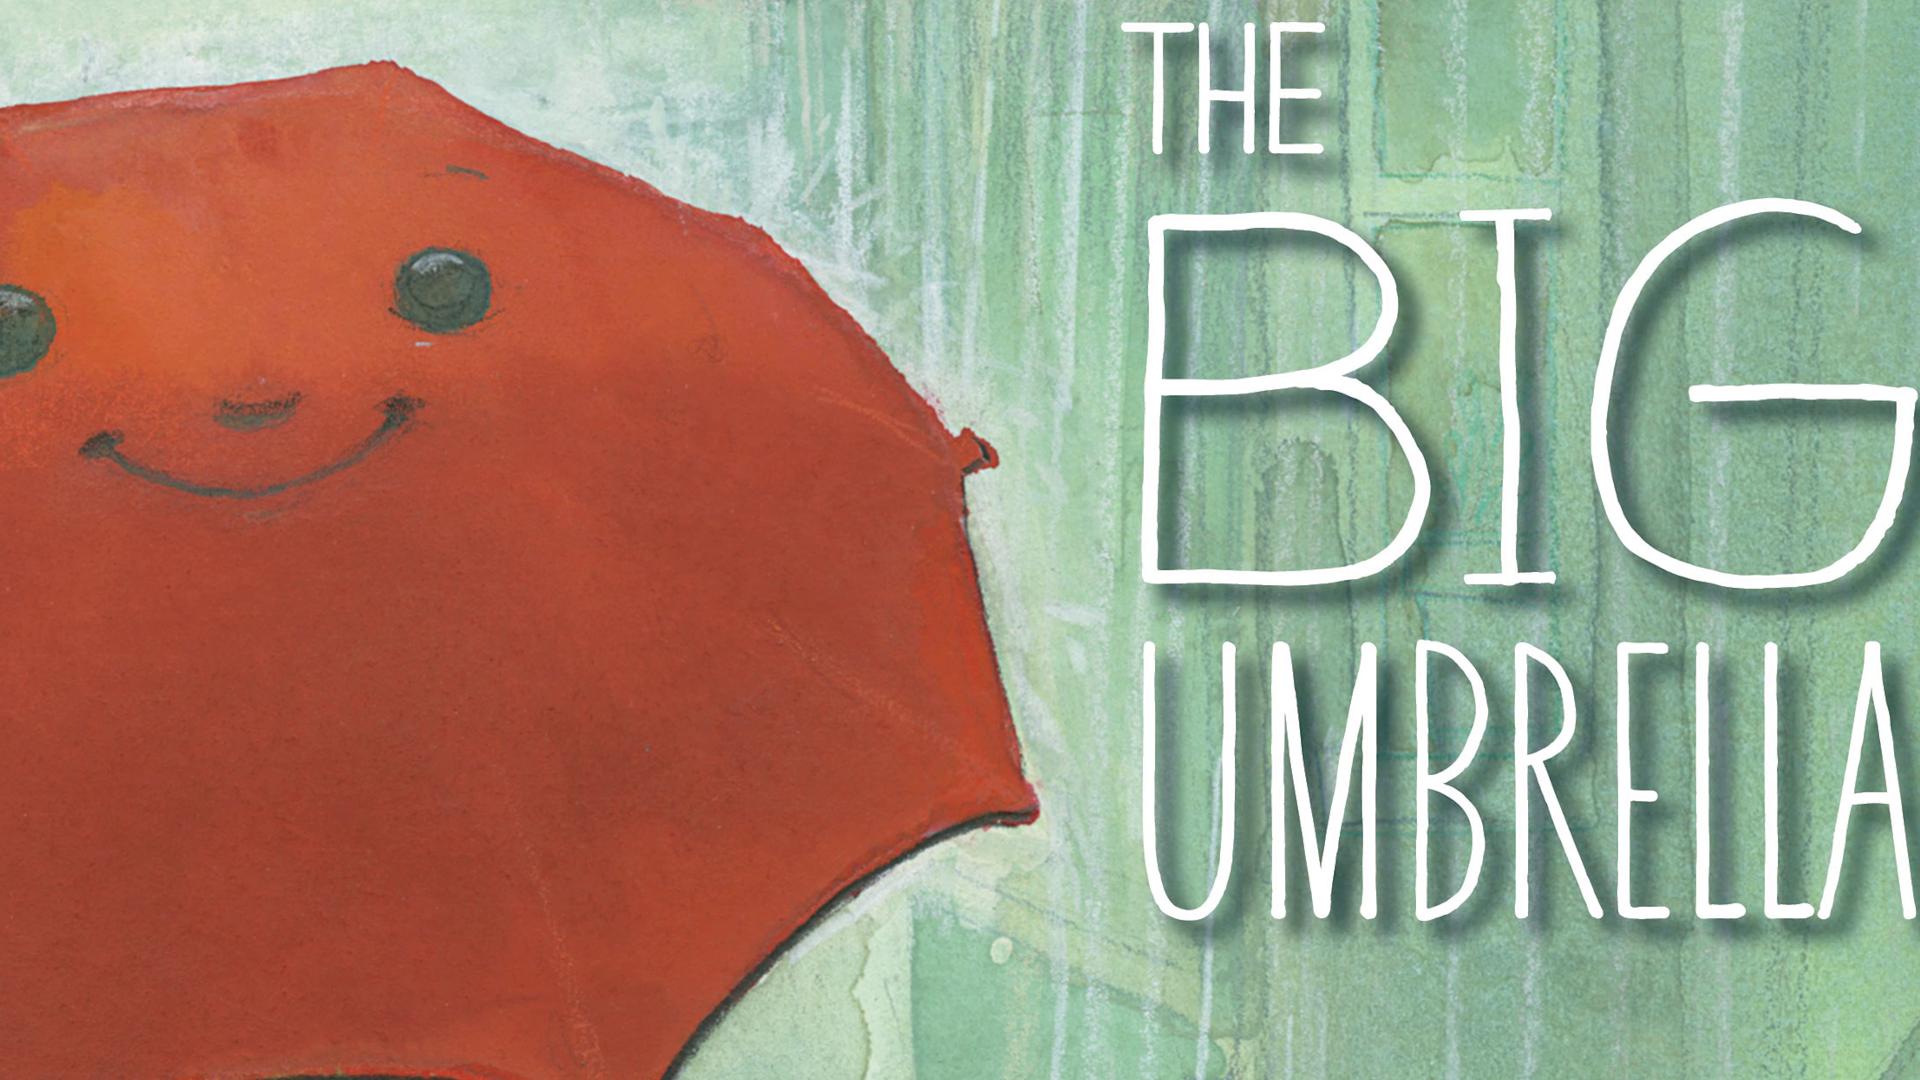 There's Always Room Under The Big Umbrella!